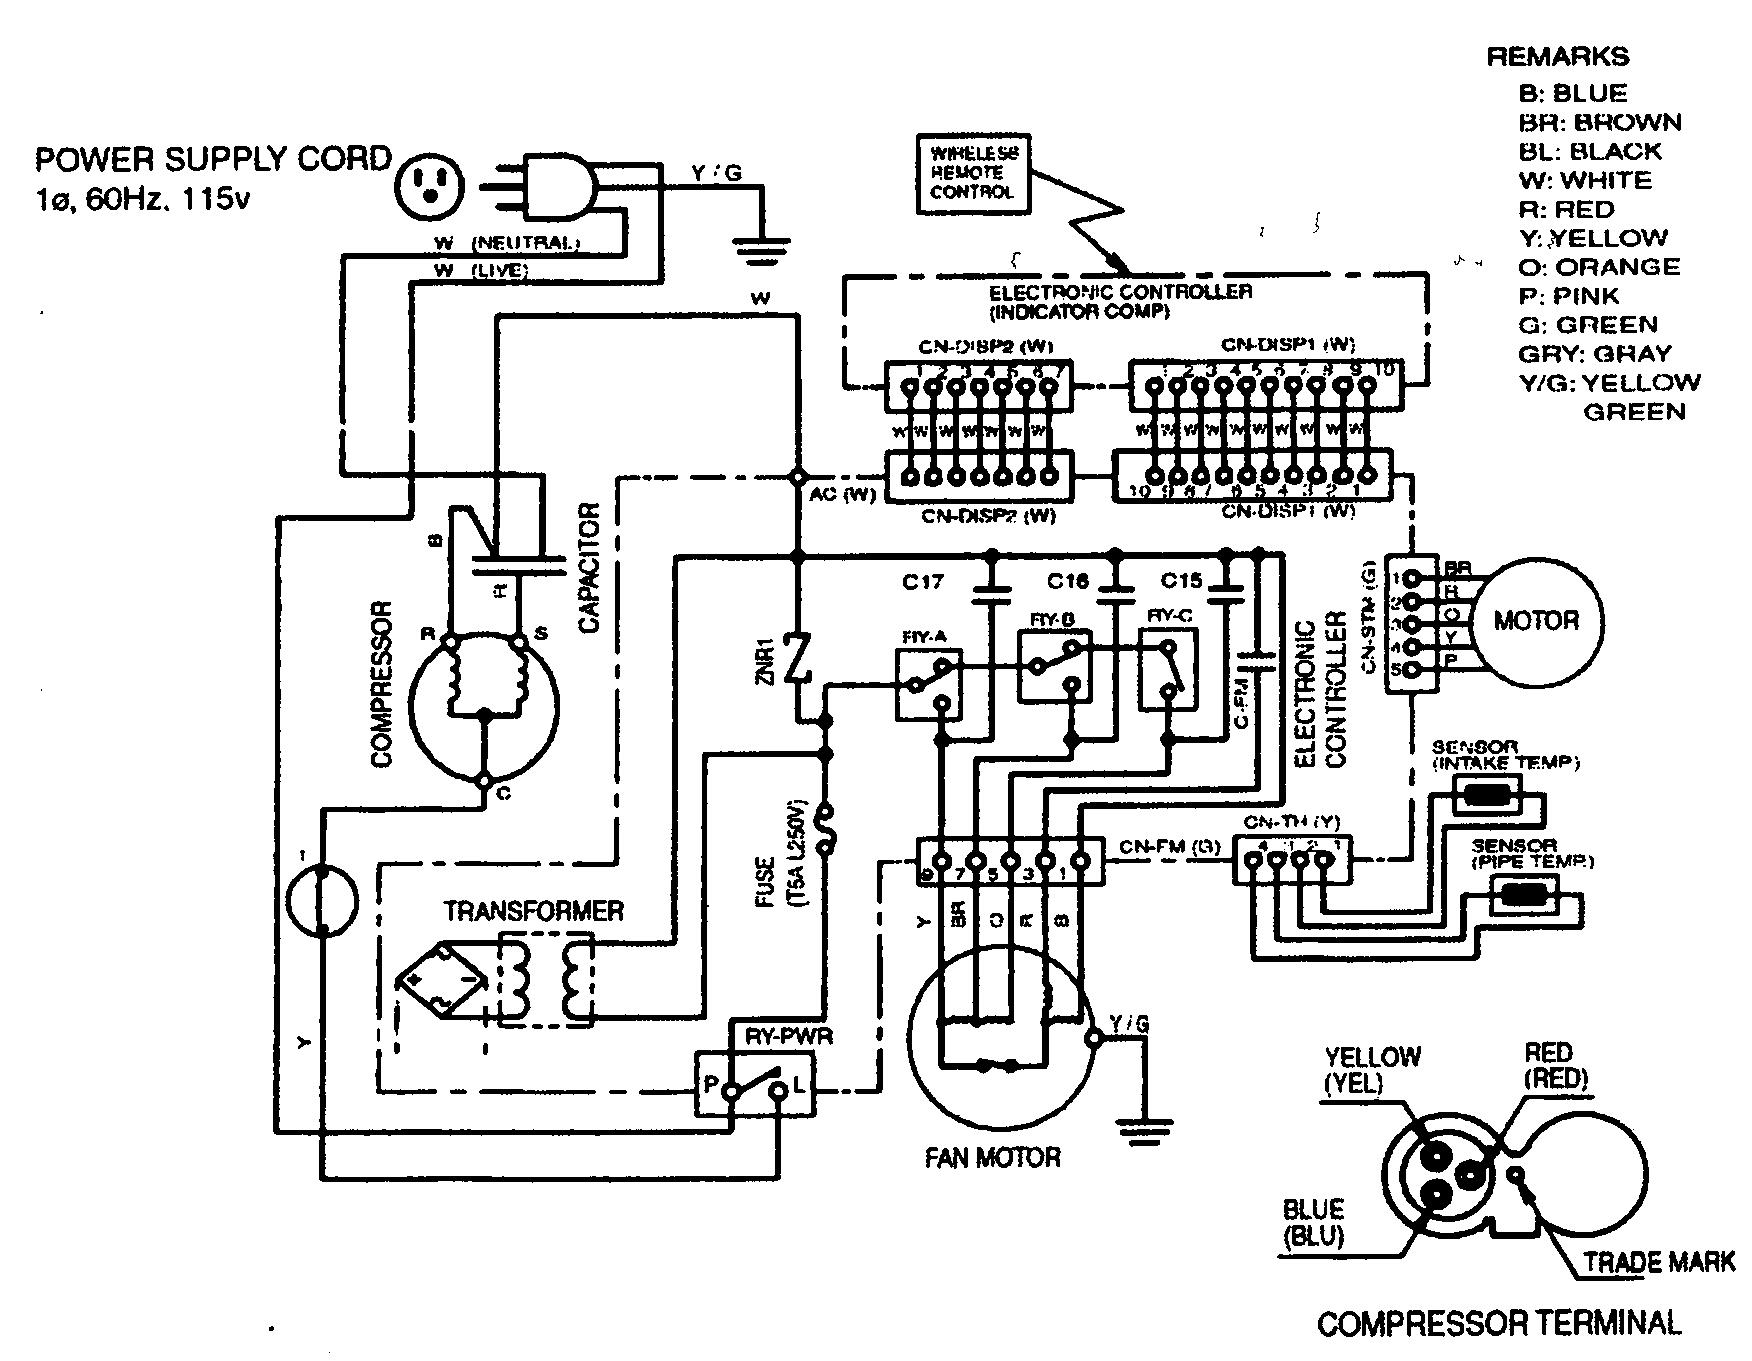 Panasonic Split System Air Conditioner Wiring Diagram